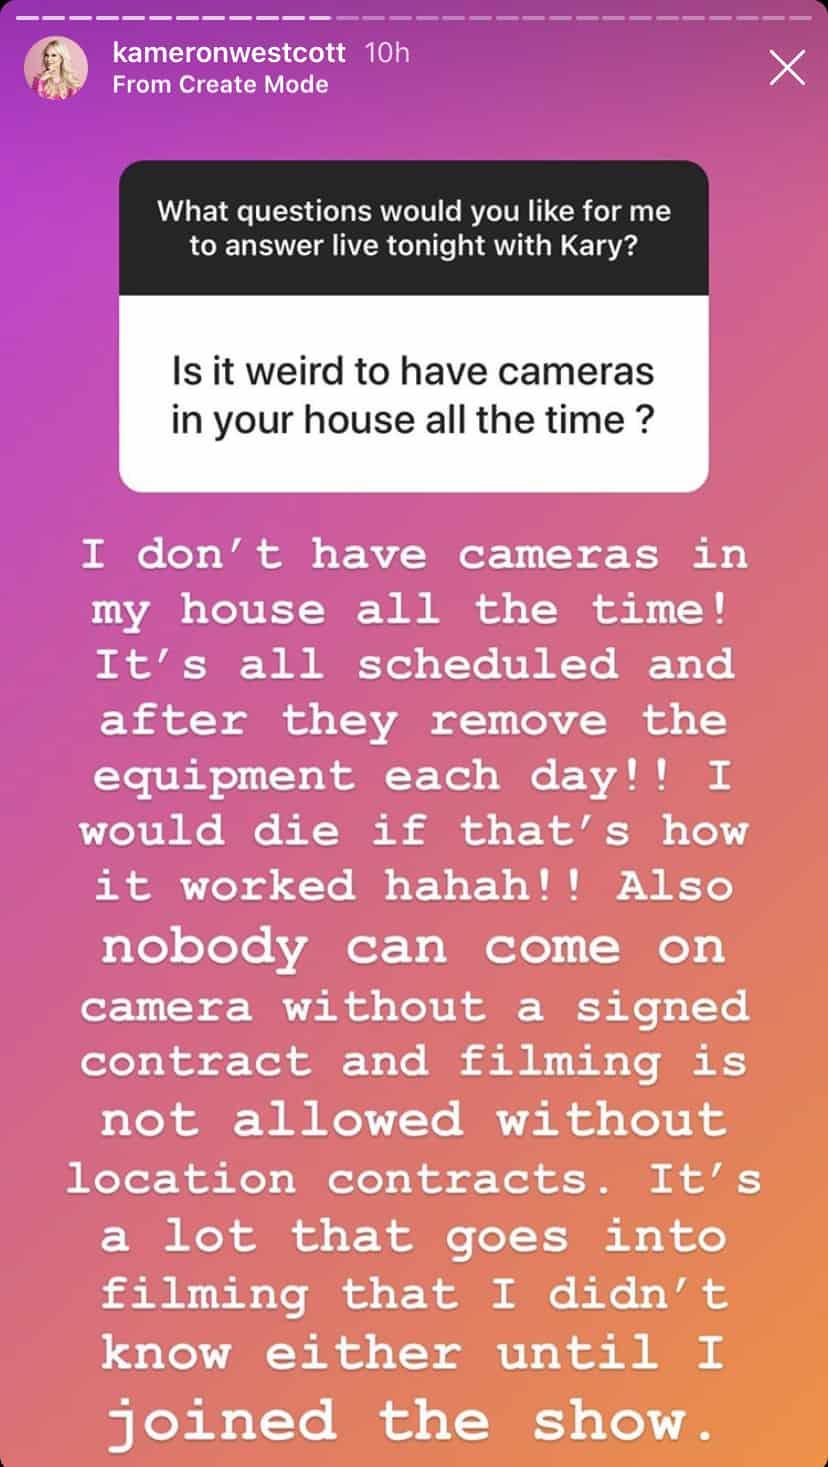 Kameron Westcott Explains Filming RHOD